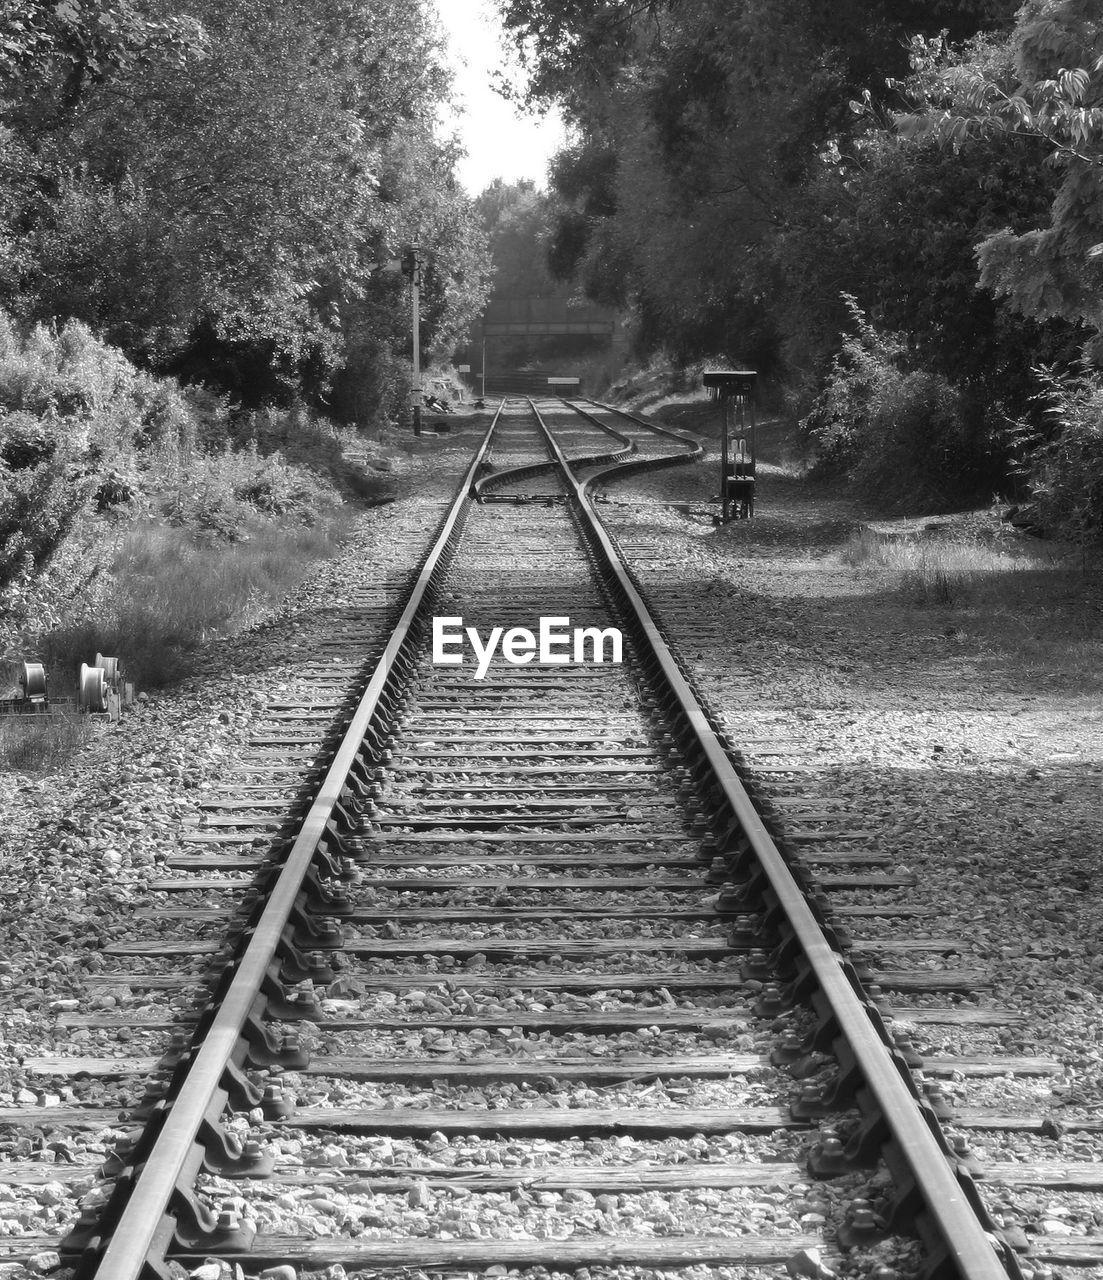 Railroad tracks amidst trees